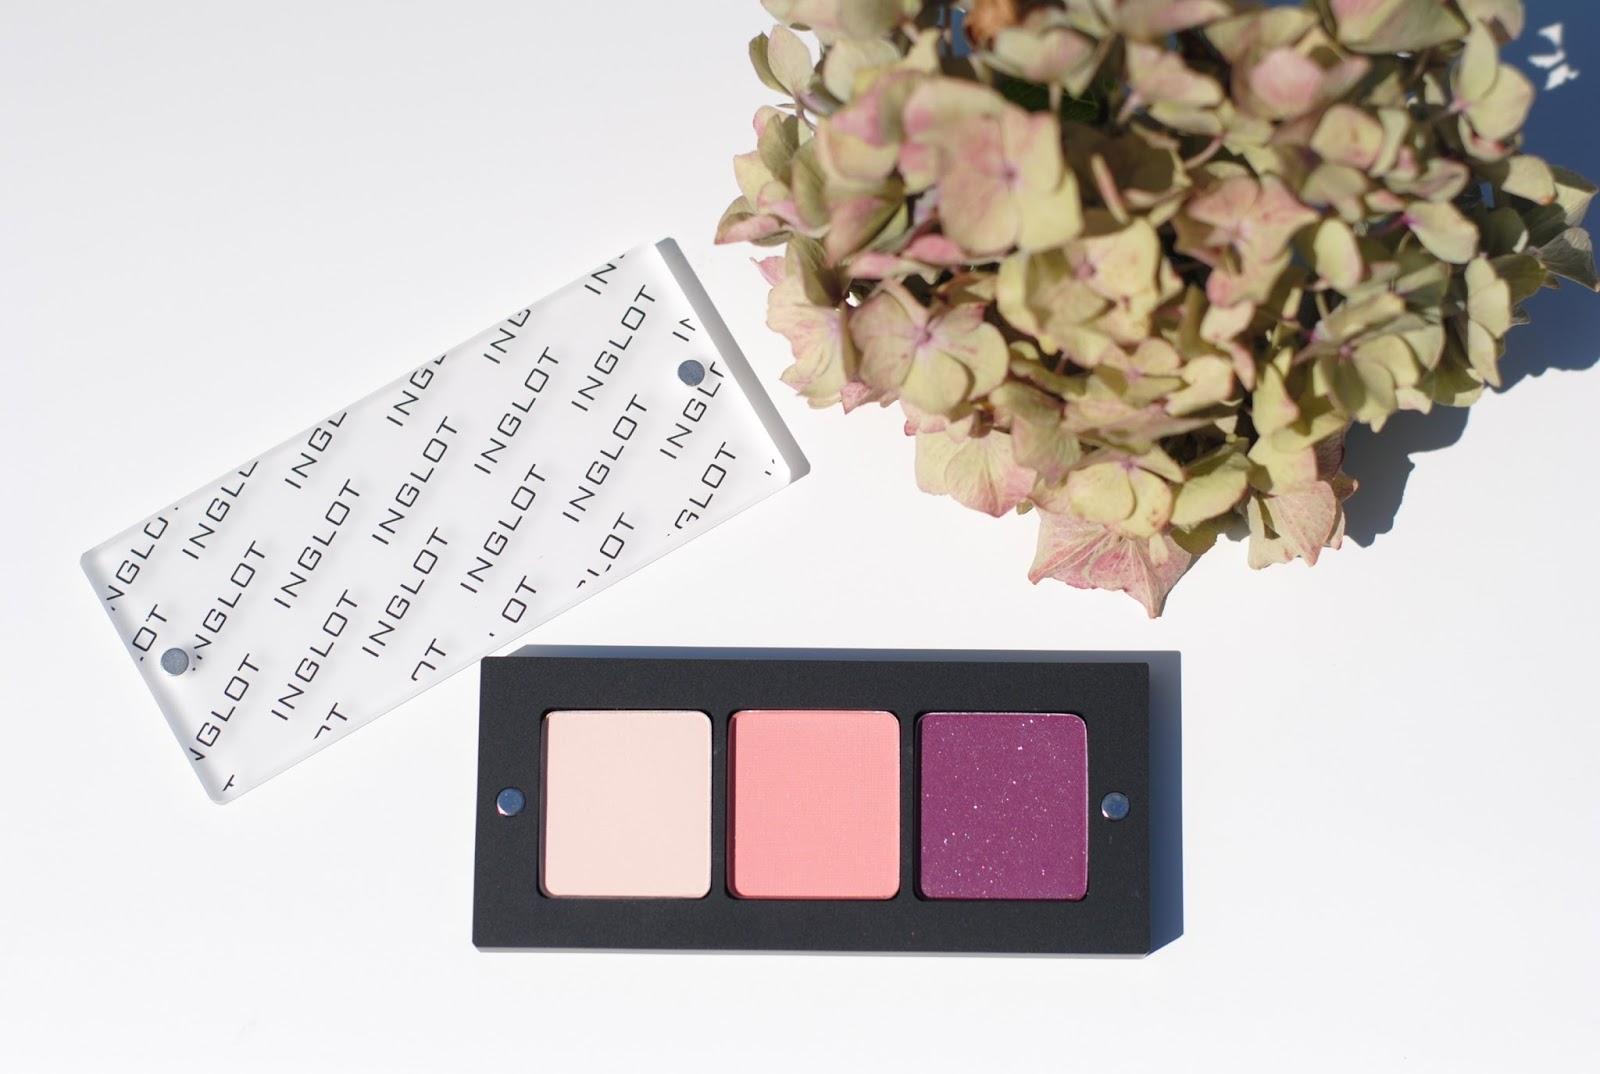 inglot peach or plum eyeshadow palette